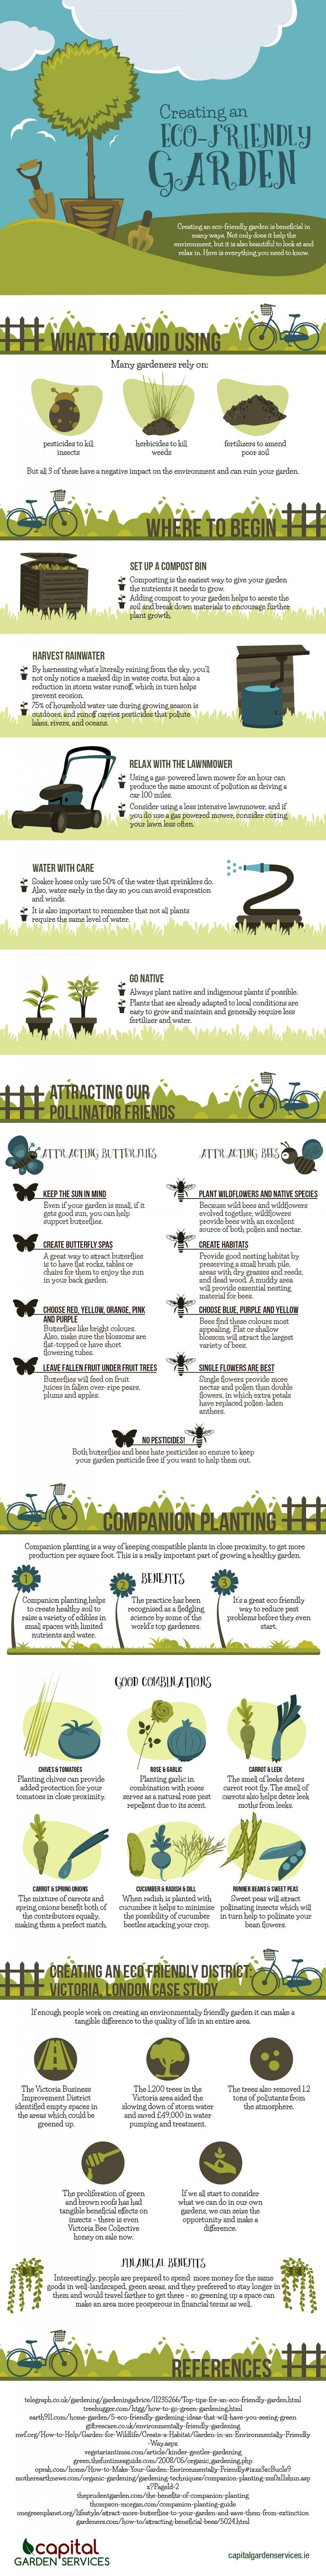 Creating an Eco-Friendly Garden-Infographic